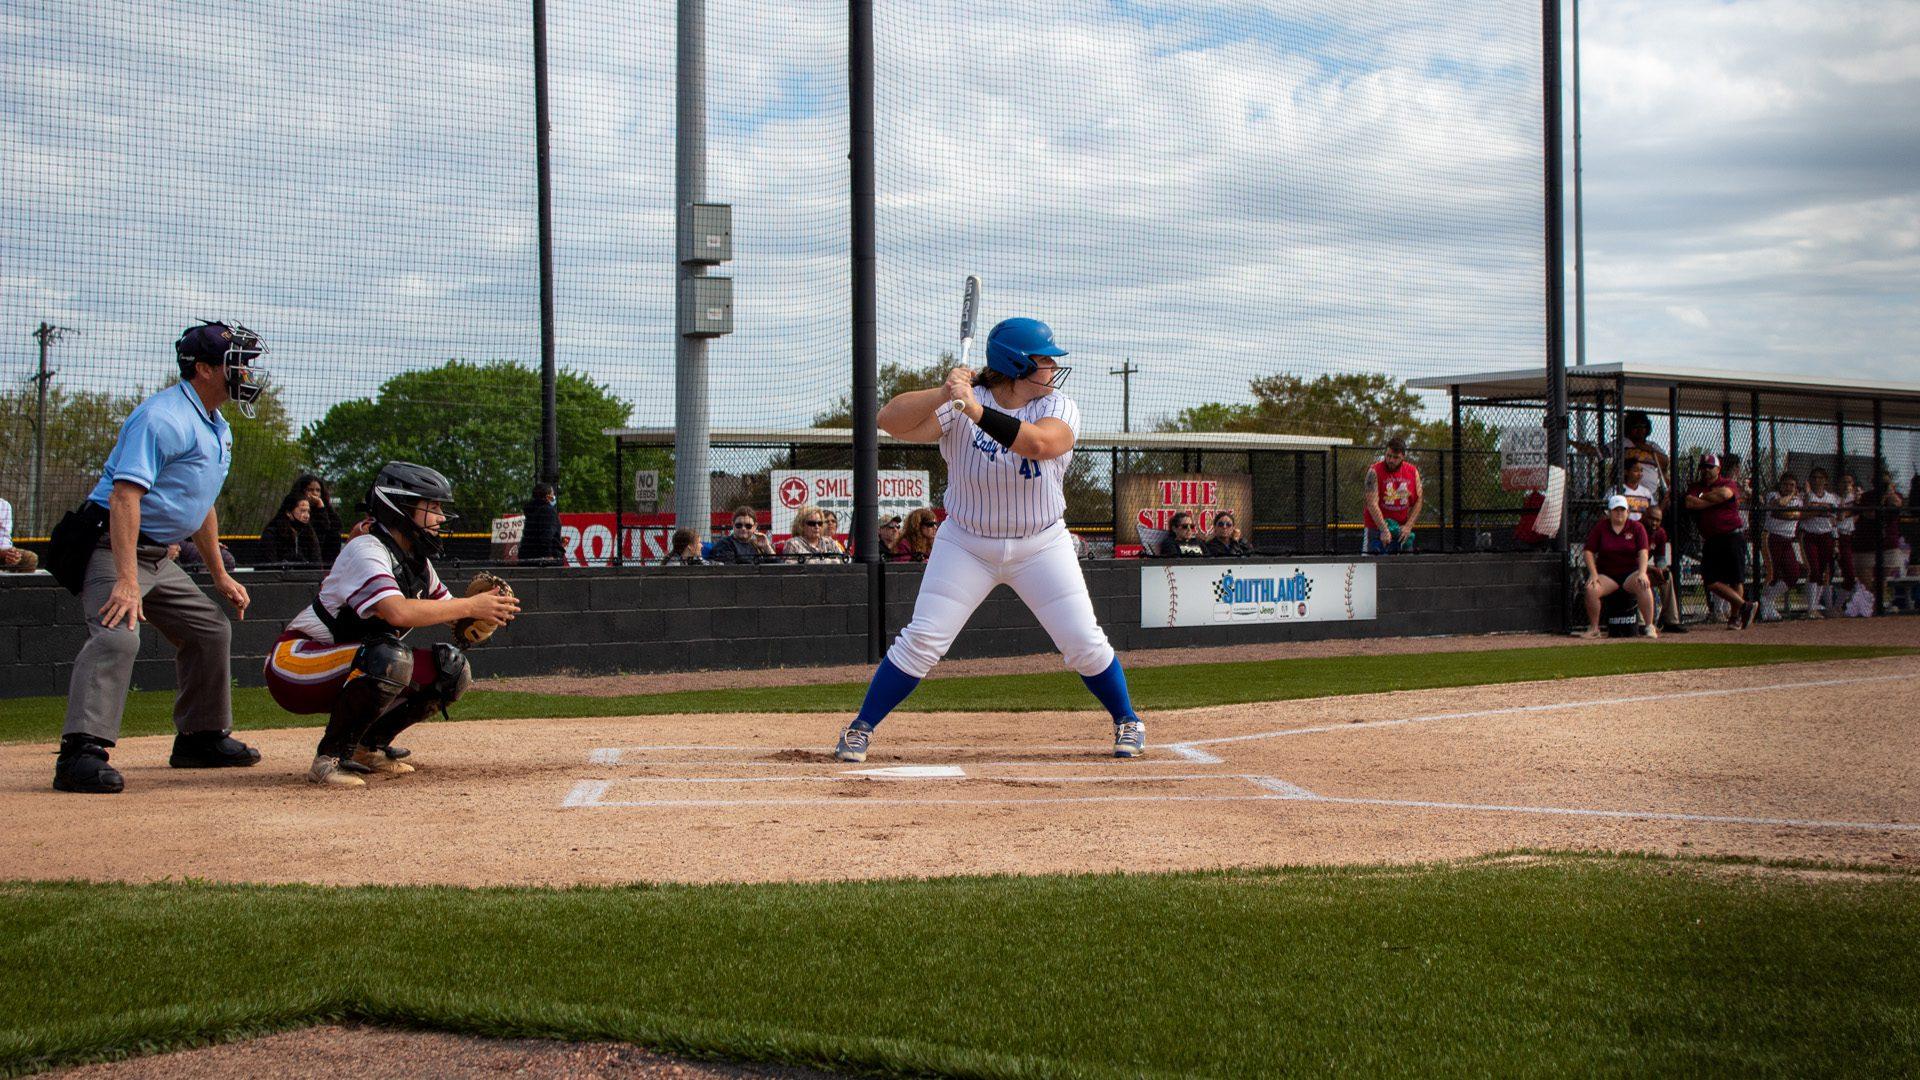 HLB batter waiting on pitch